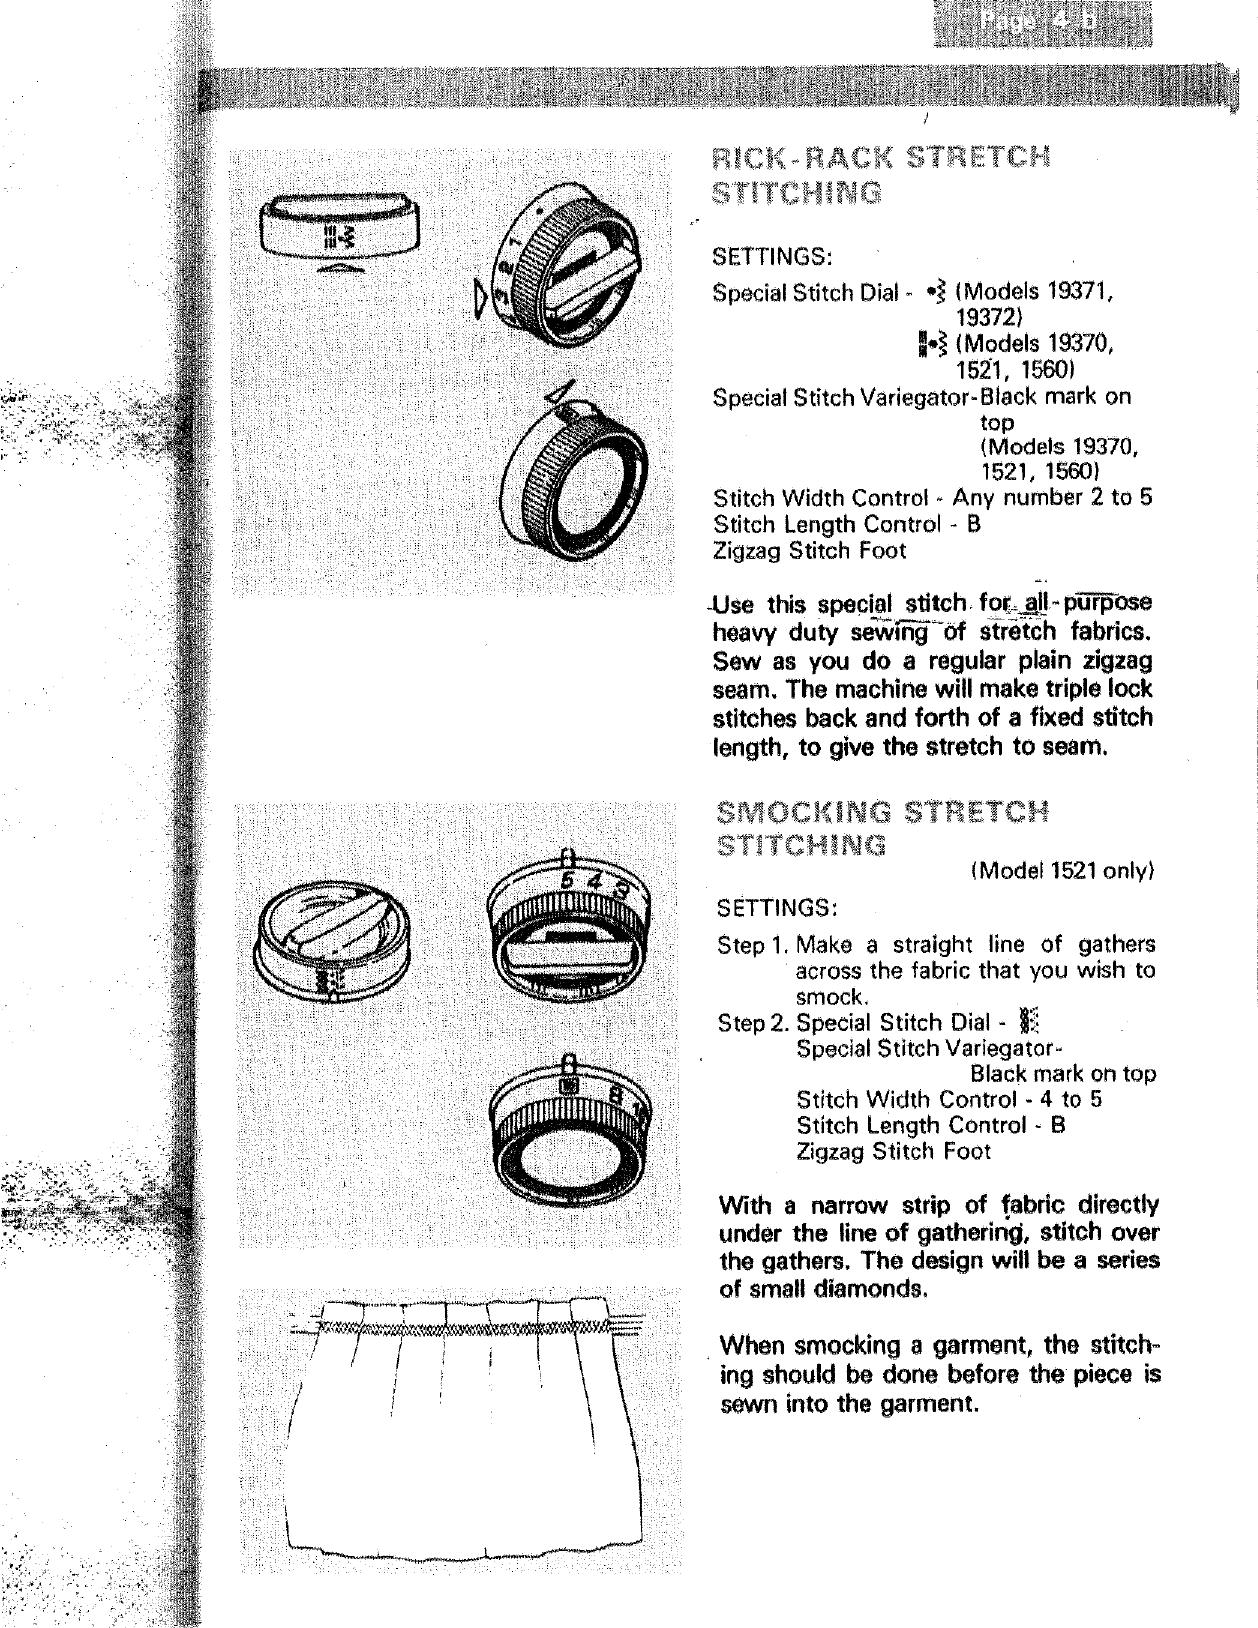 Kenmore 14815210 User Manual SEWING MACHINE Manuals And